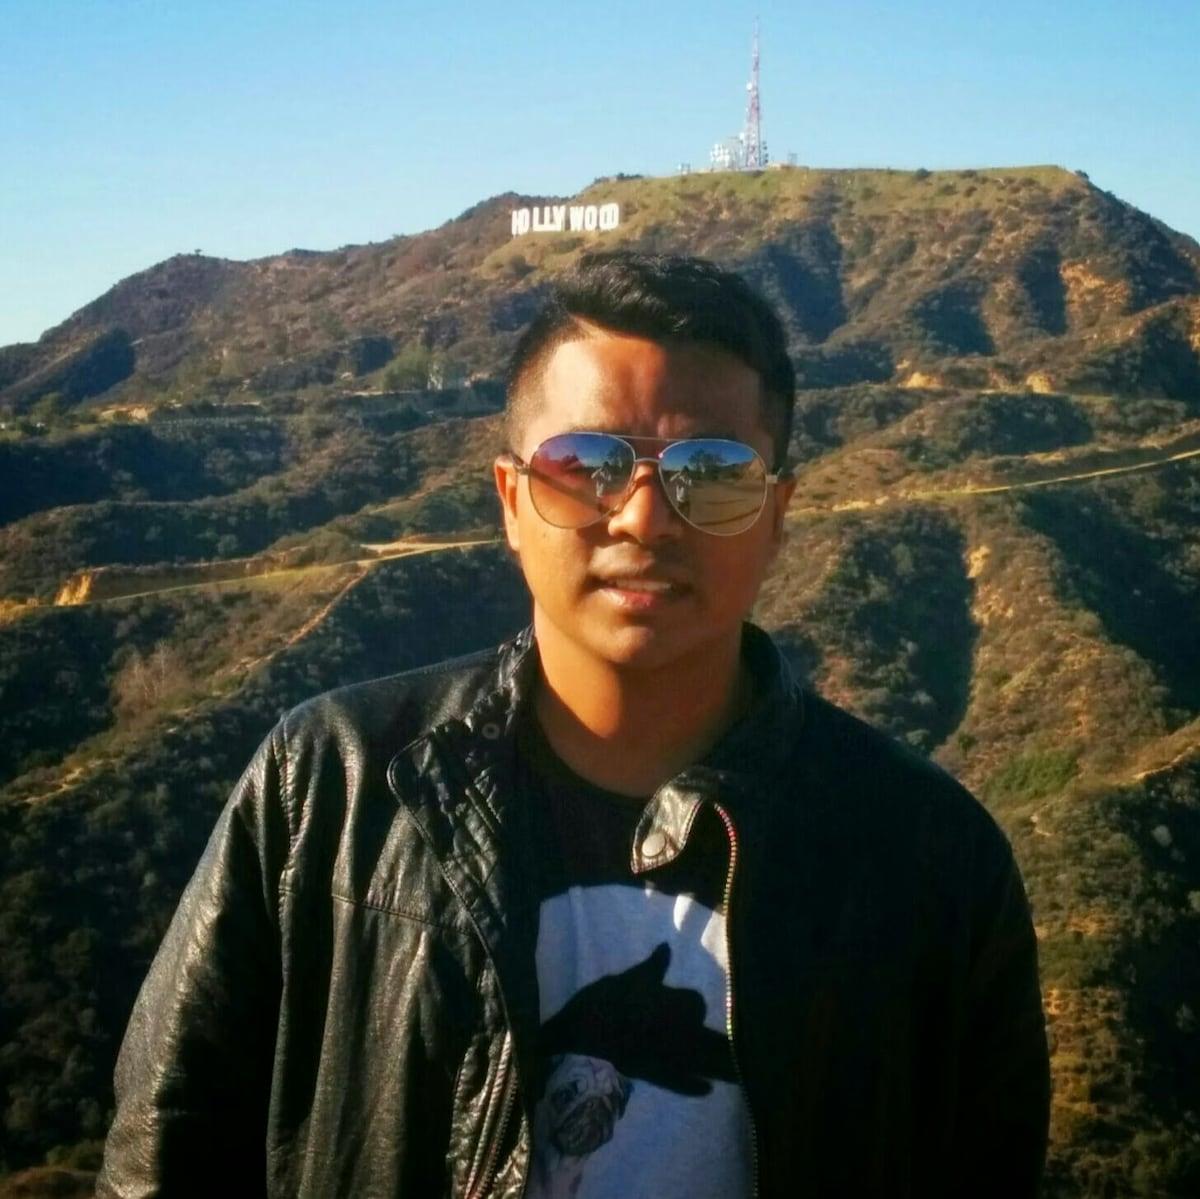 Shanggar